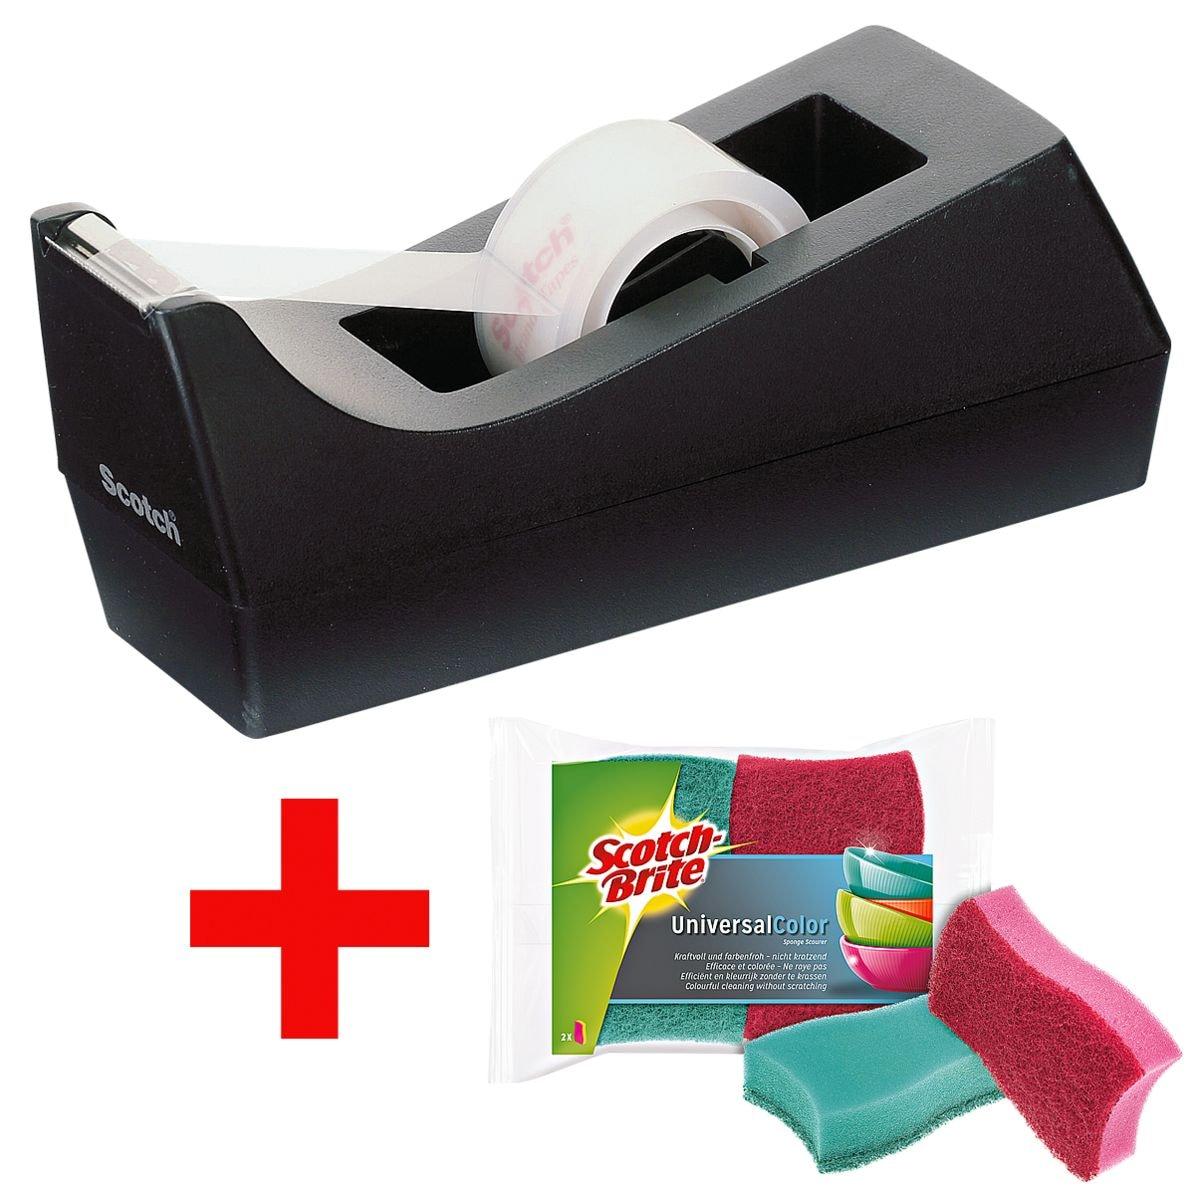 Scotch Tischabroller-Set »C38 + Crystal Clear Tape 600« inkl. 2er-Pack Reinigungsschwämme »Universal Color«